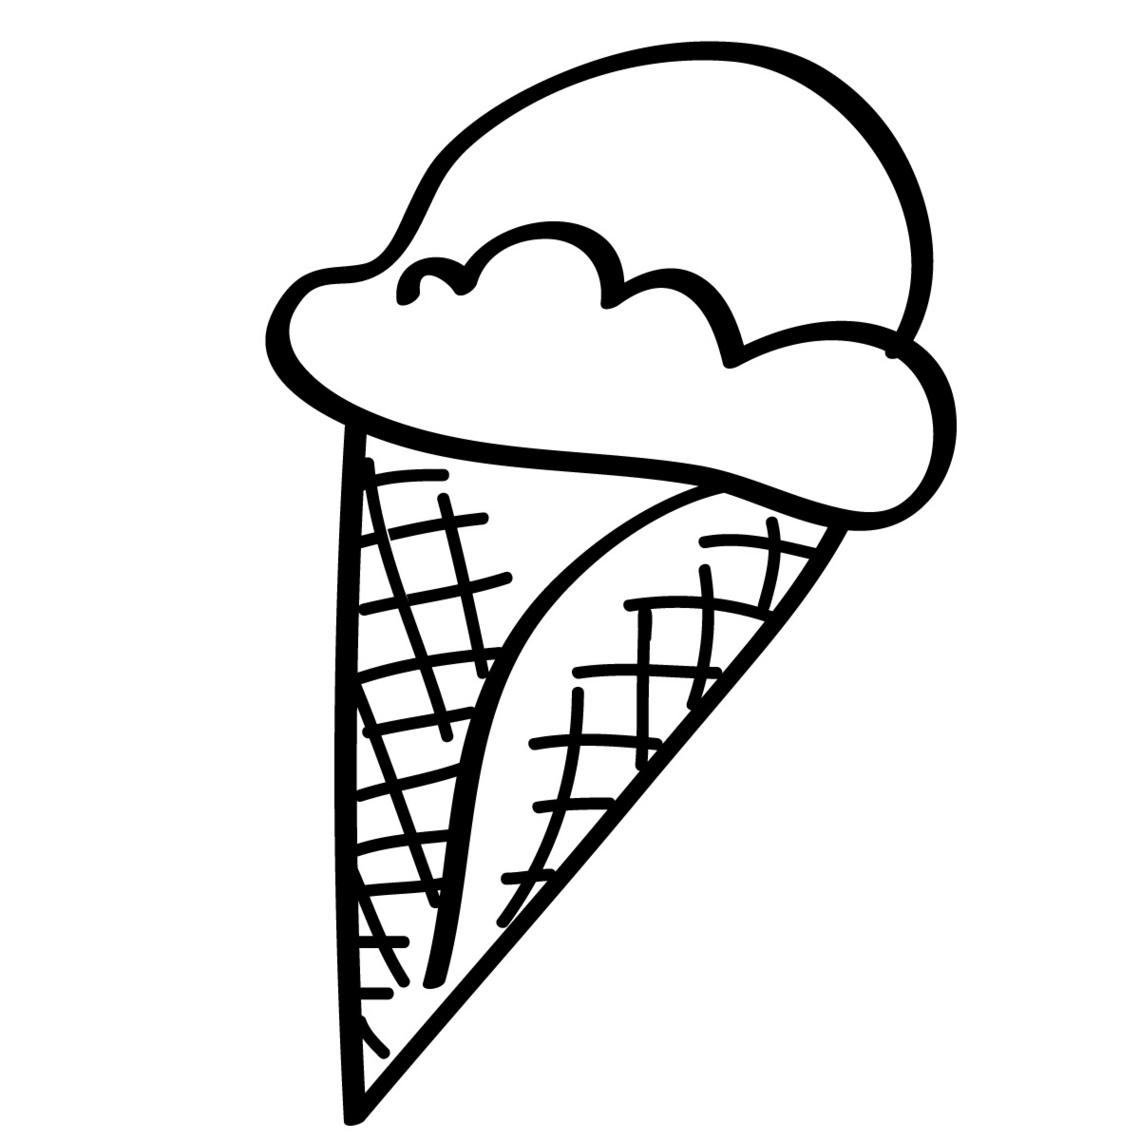 Ice Cream Sundae Coloring Page Clipart Panda